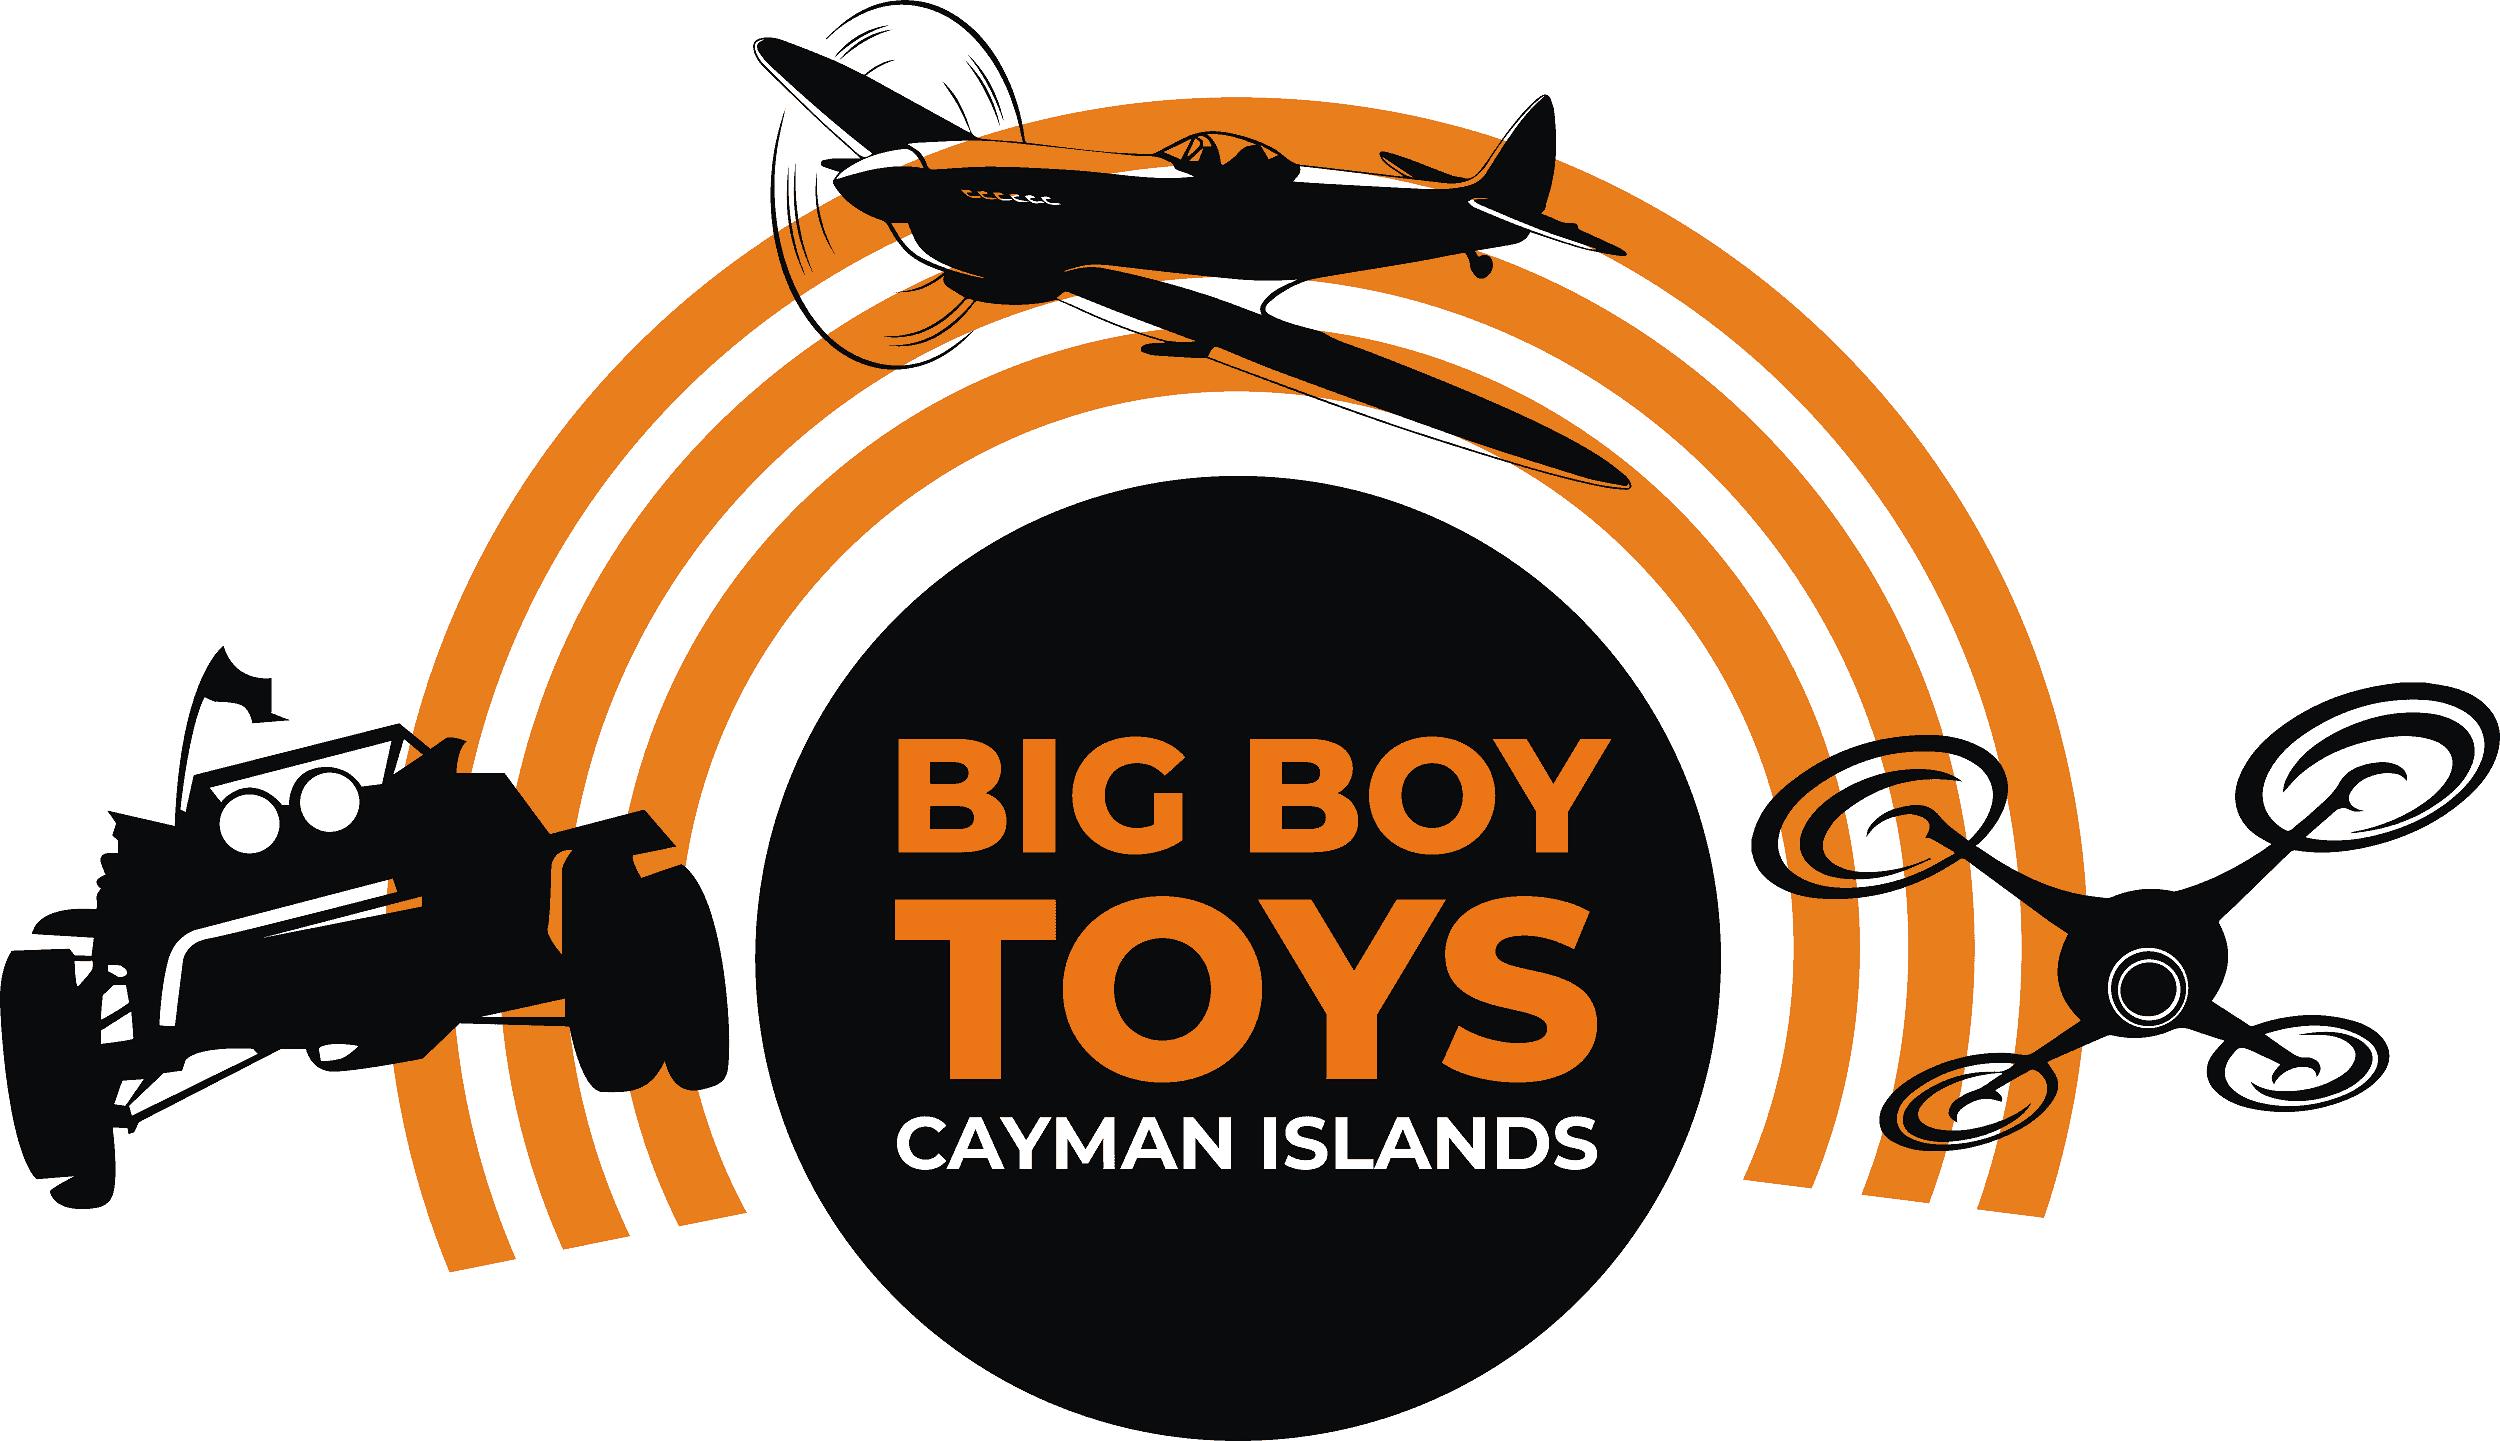 BIg Boy Toys Ltd.